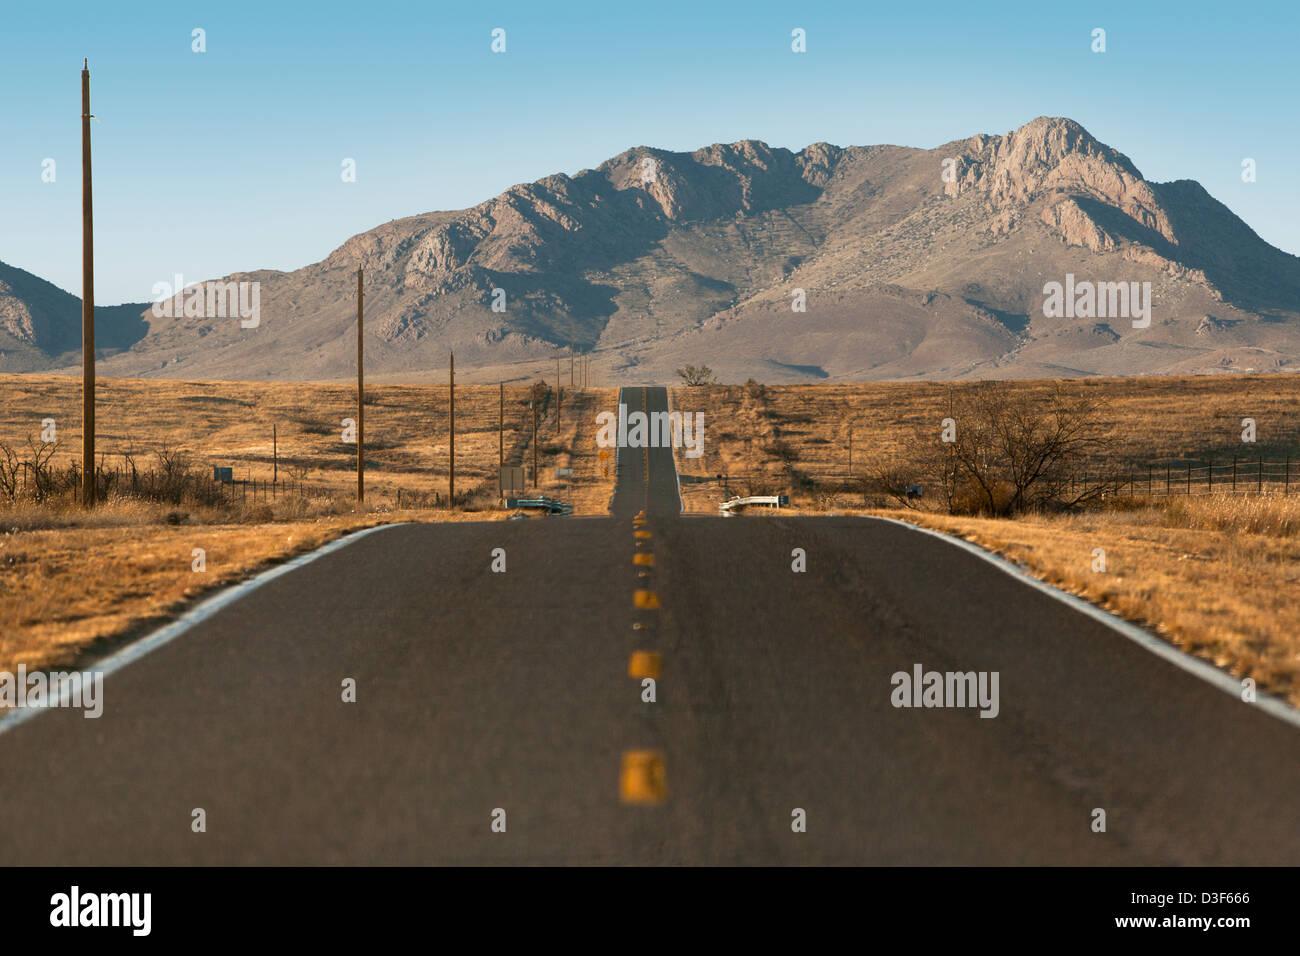 Long desert road in southern Arizona. - Stock Image